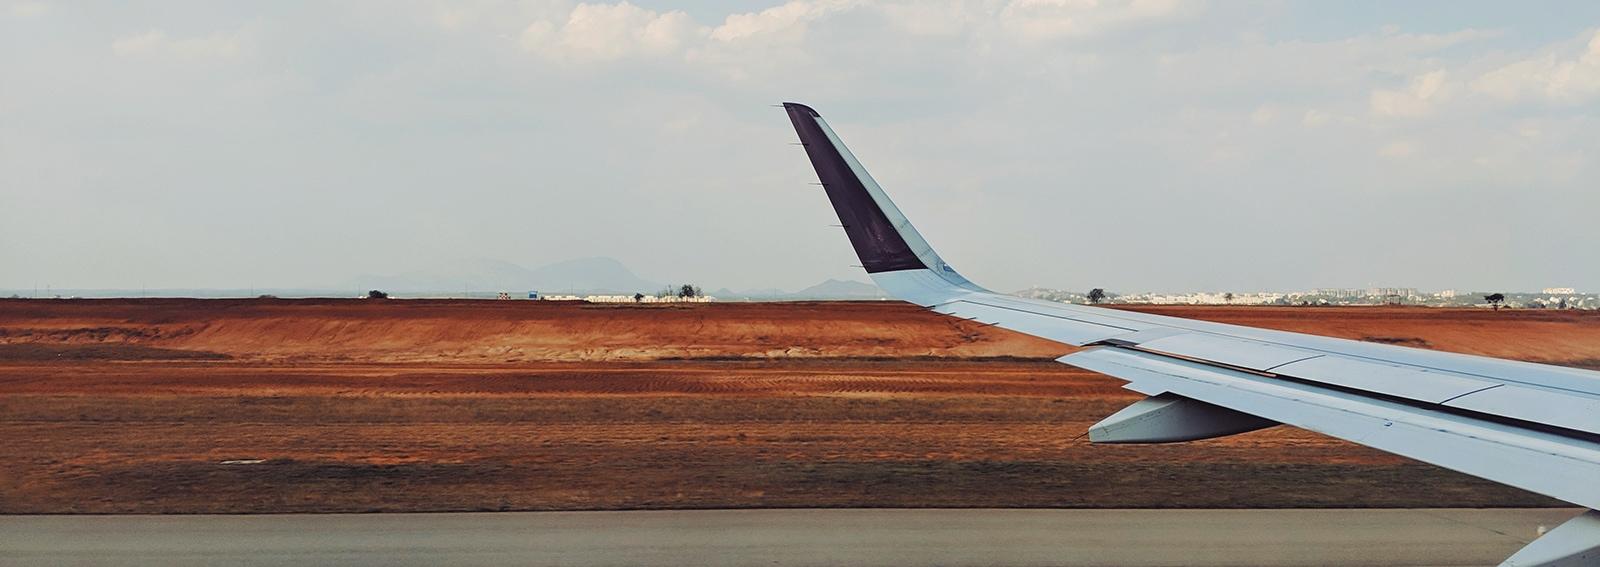 faris-mohammed-aereoplano-unsplash